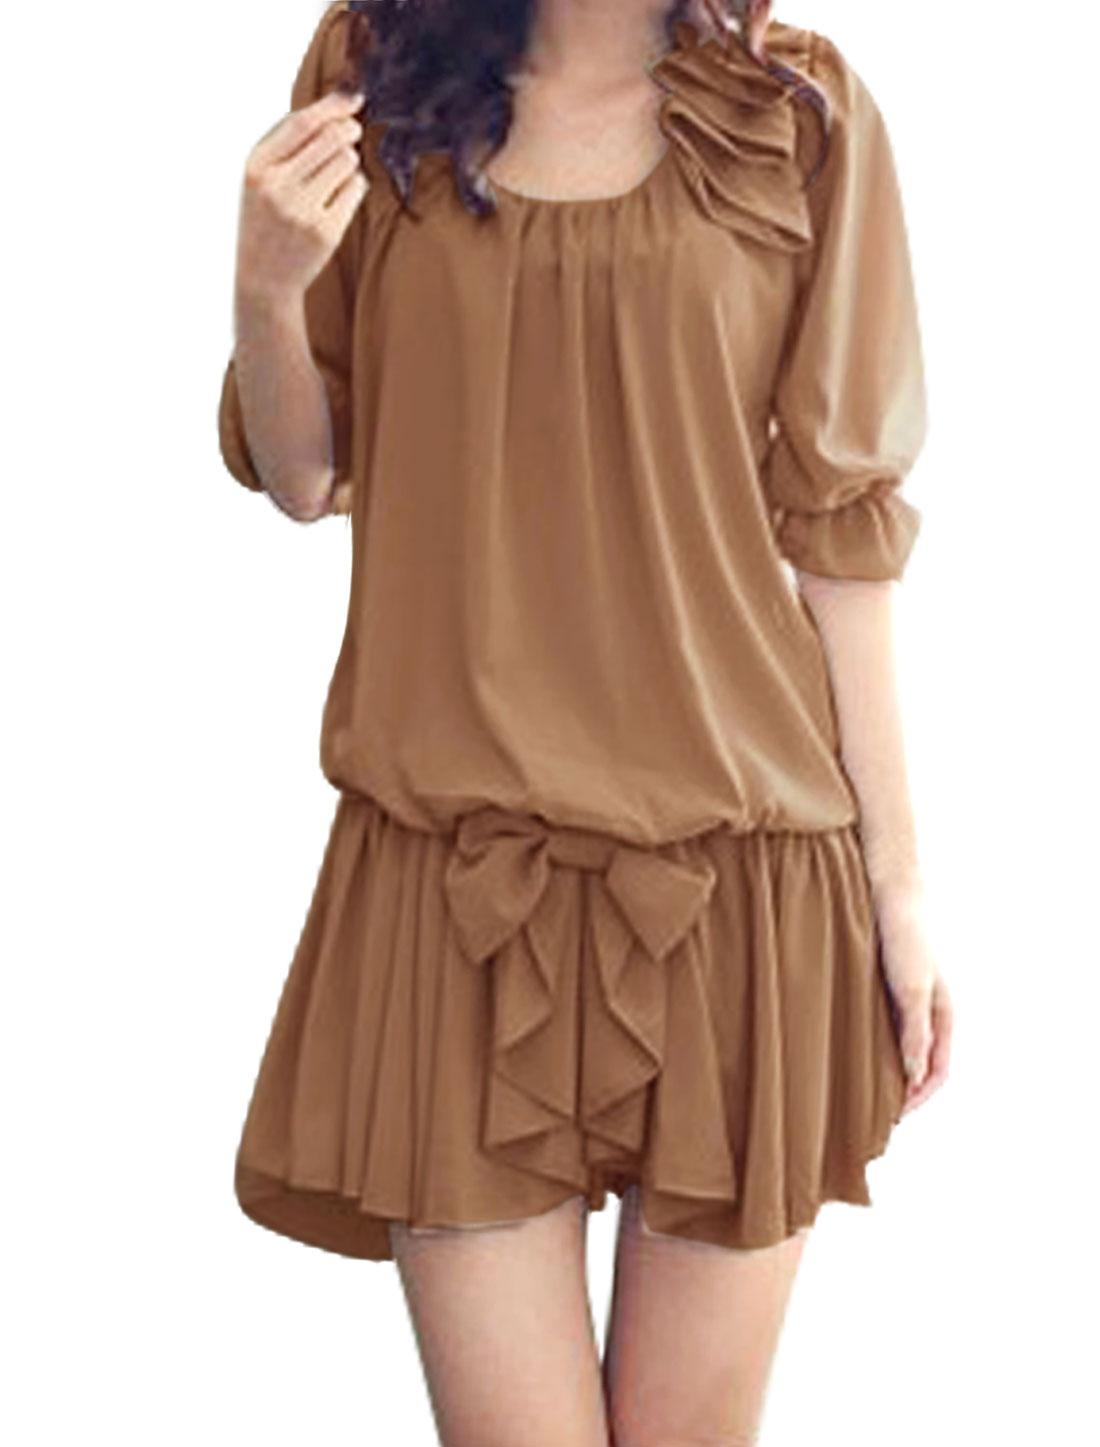 Ladies Khaki Color Stretchy Waistband Bowknot Decor Scoop Neck Chiffon Dress L